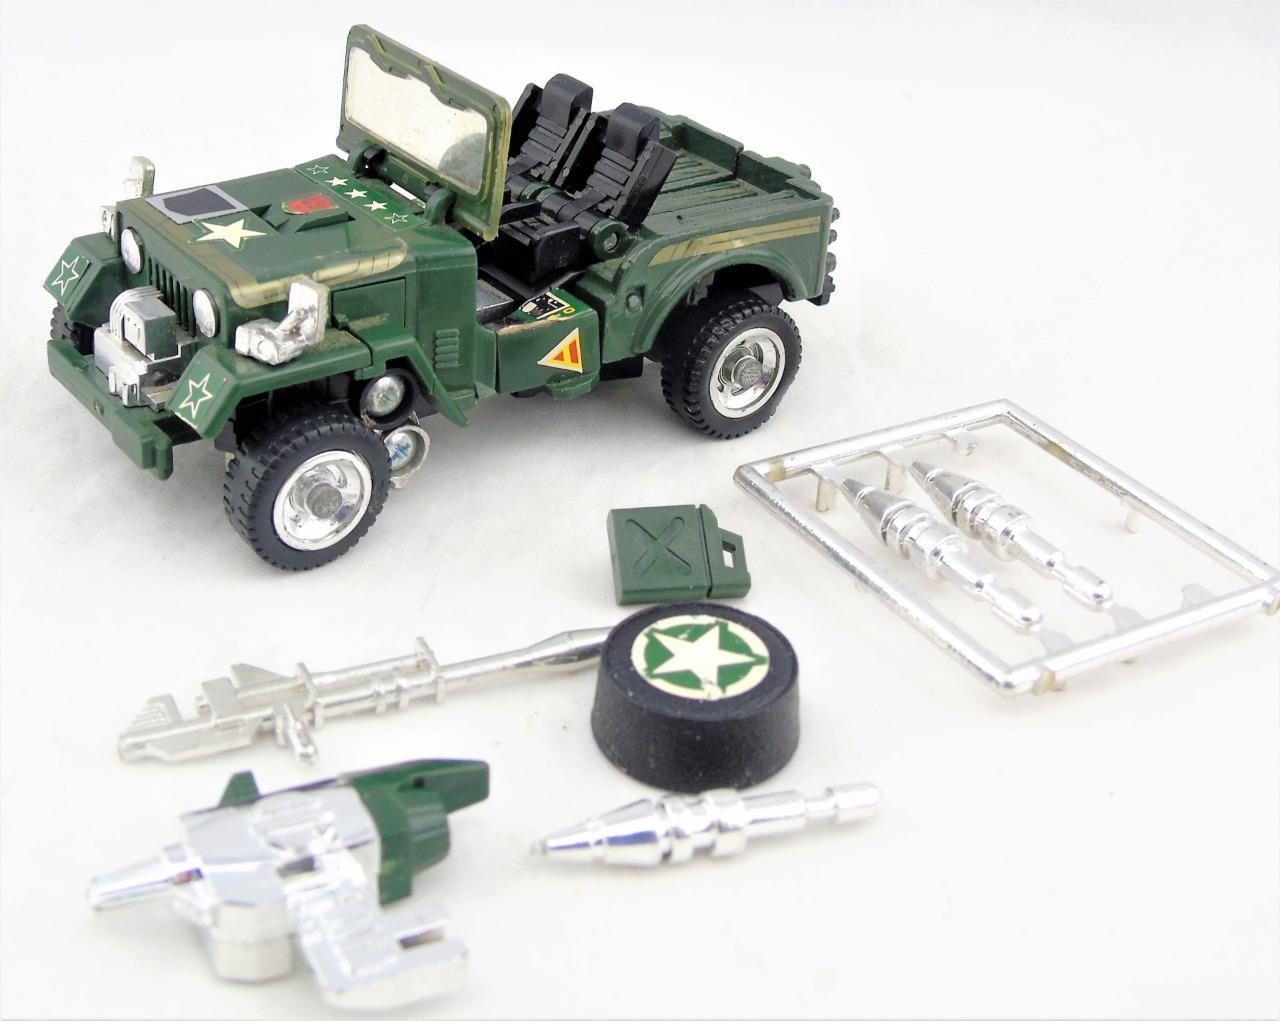 Transformers Original G1 1984 Autobot Car Hound Complete